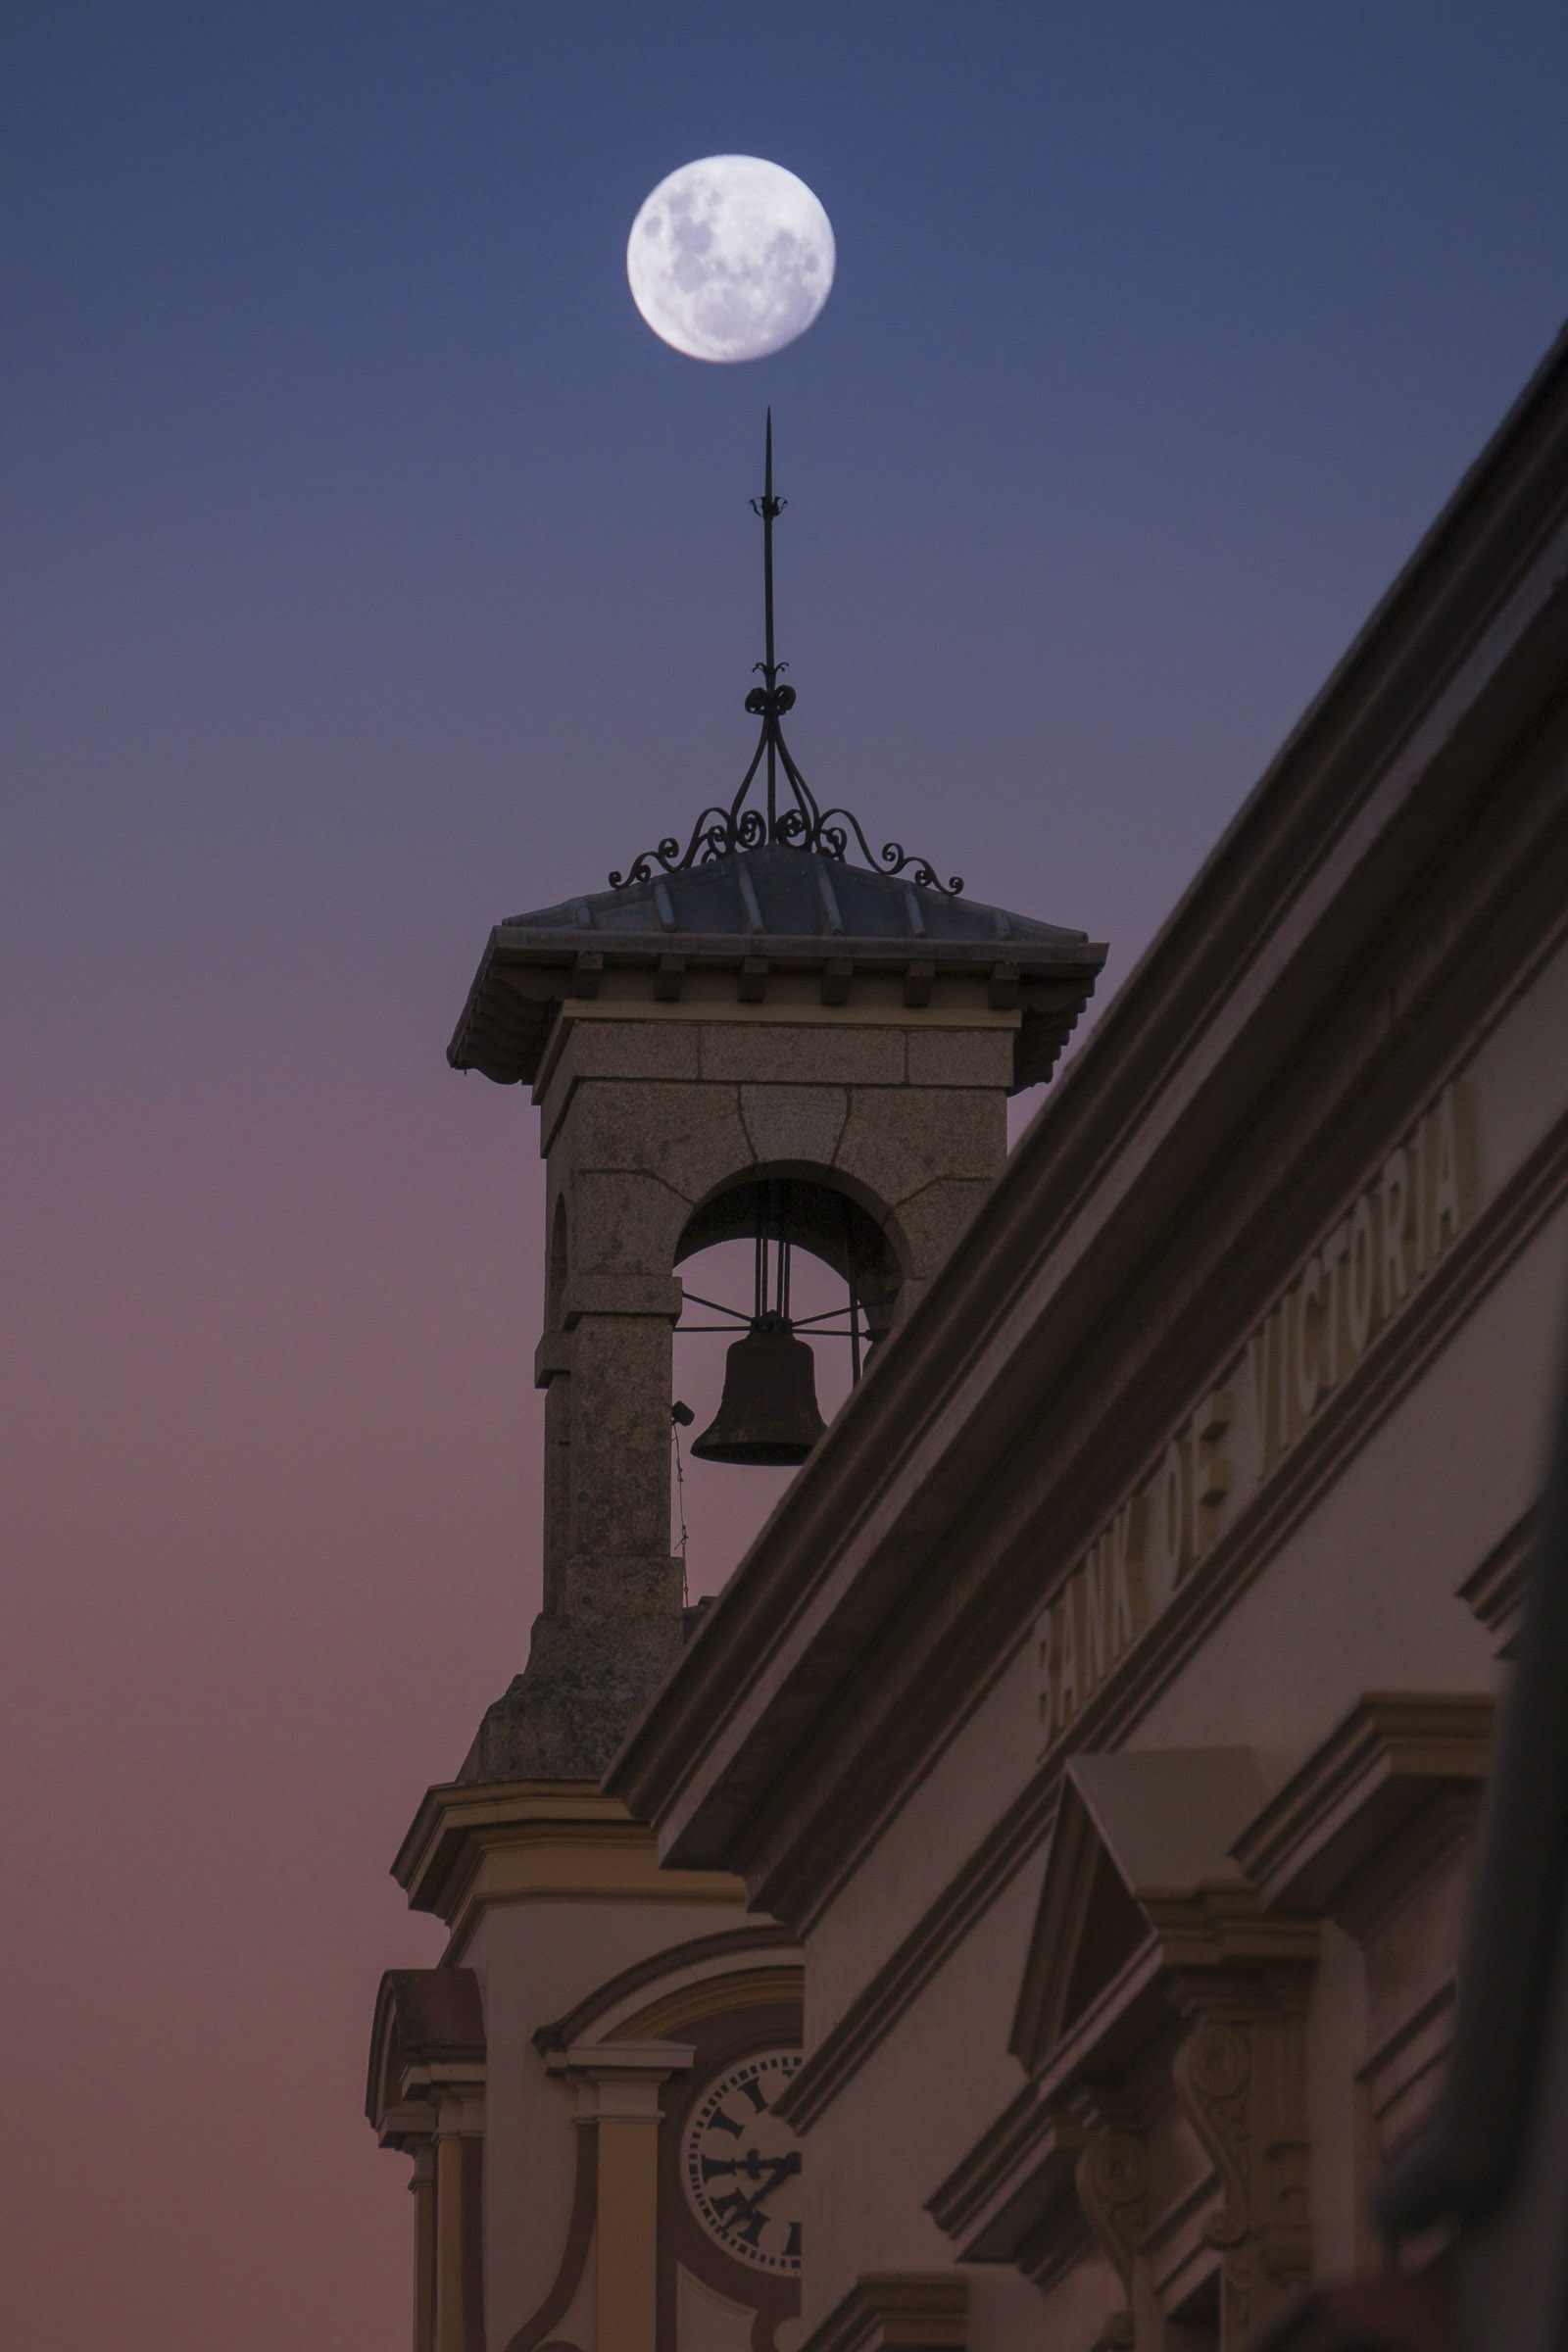 Moon over Post Office clocktower